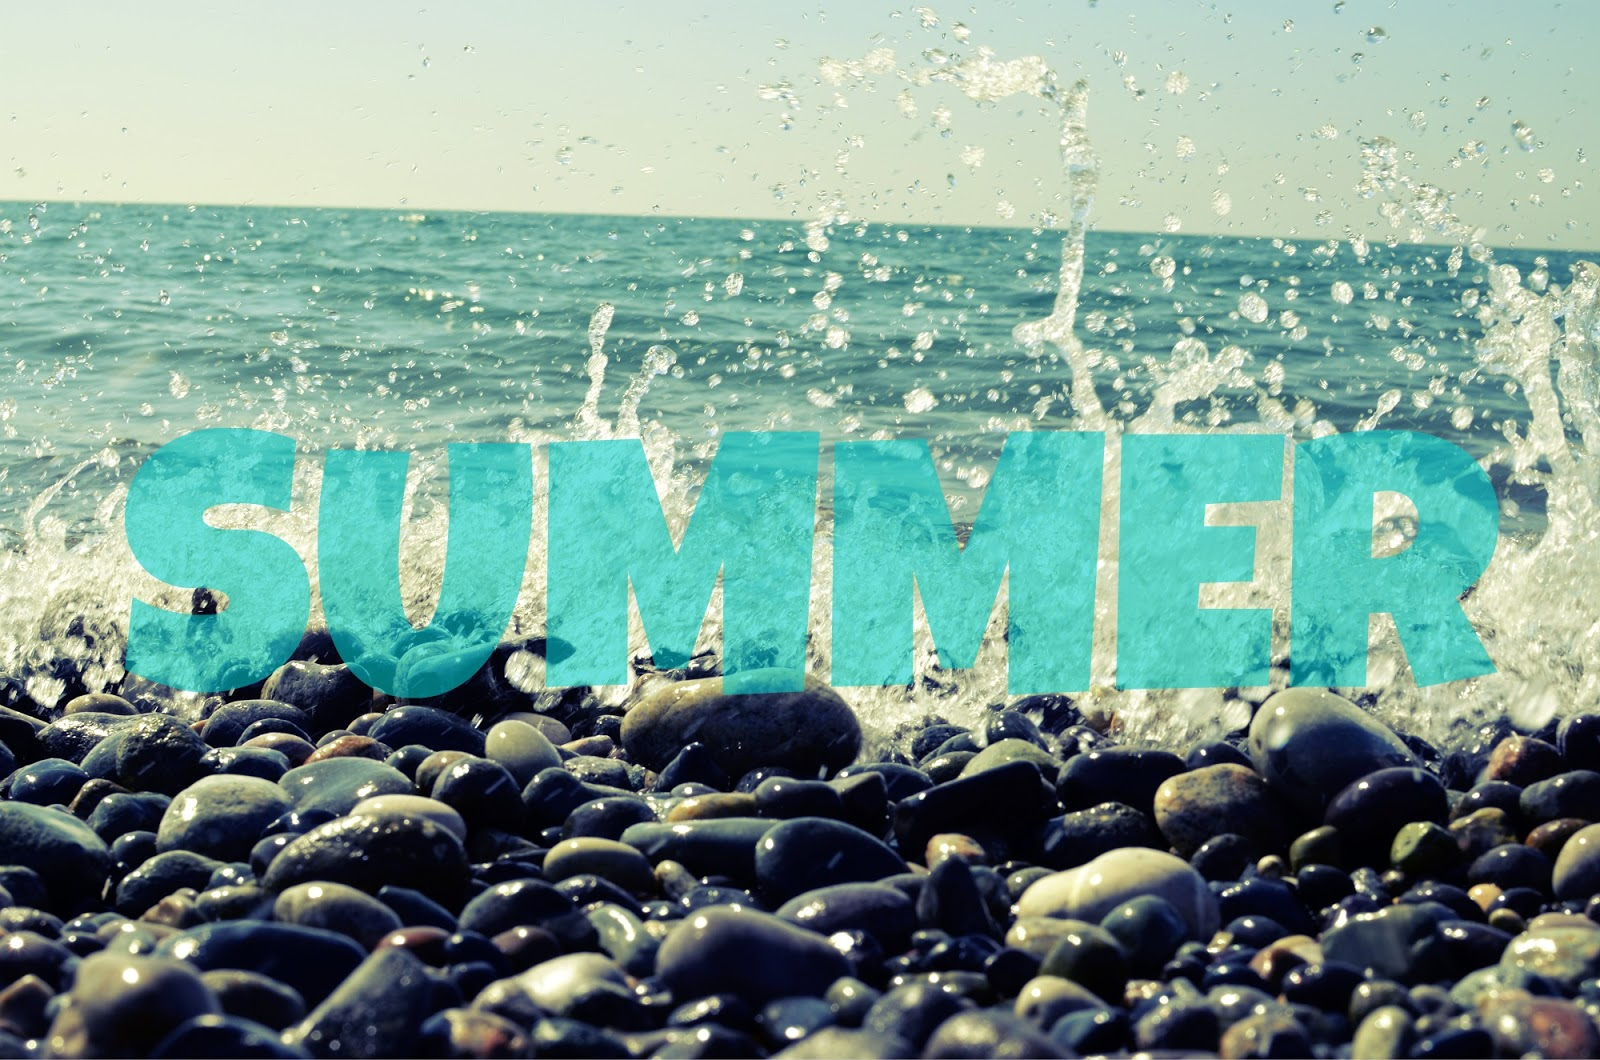 Summer. ზამბახისფერი ზღვა